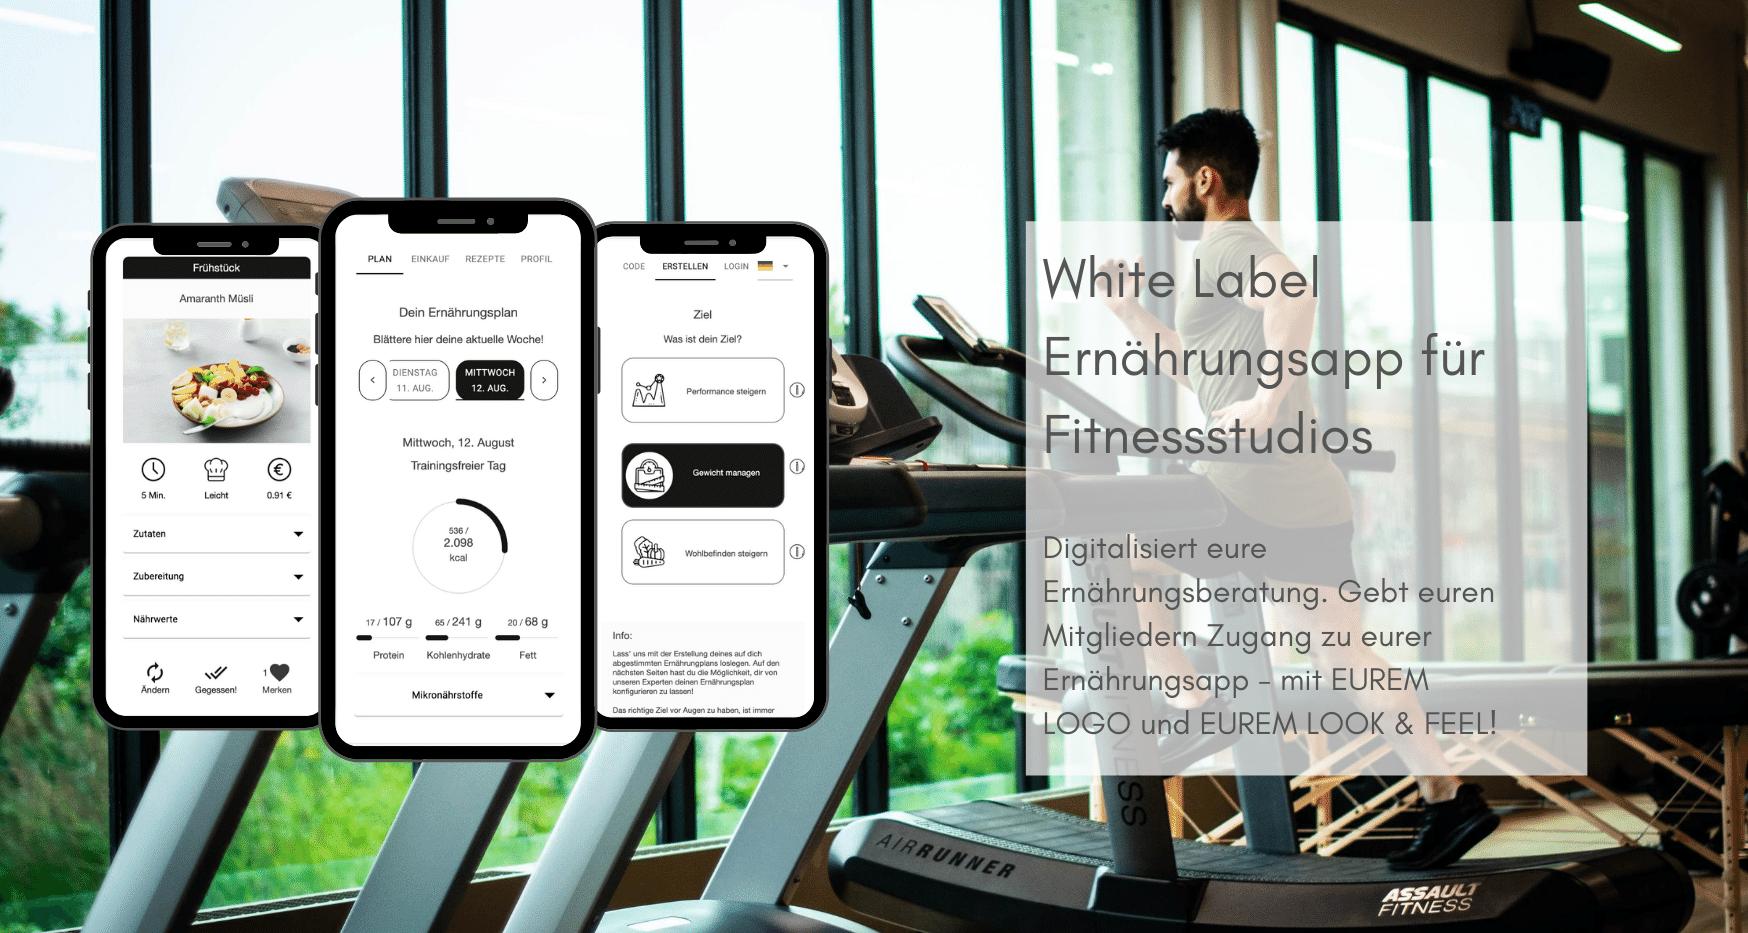 White Label App für Fitnessstudios